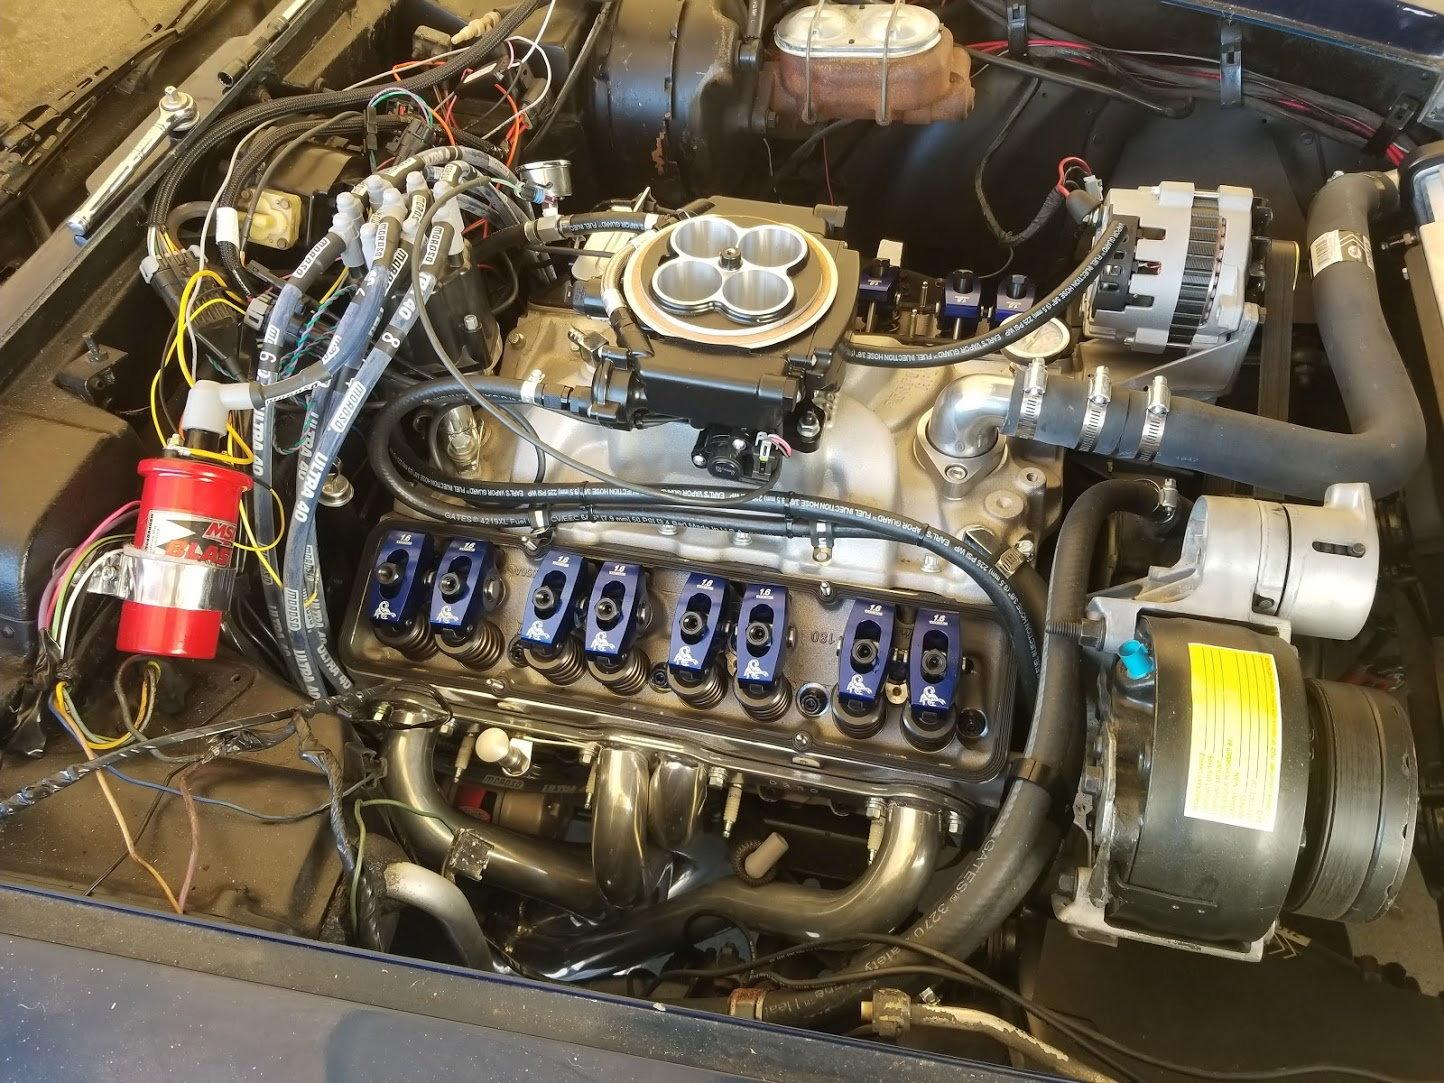 Fitech injection any good - CorvetteForum - Chevrolet